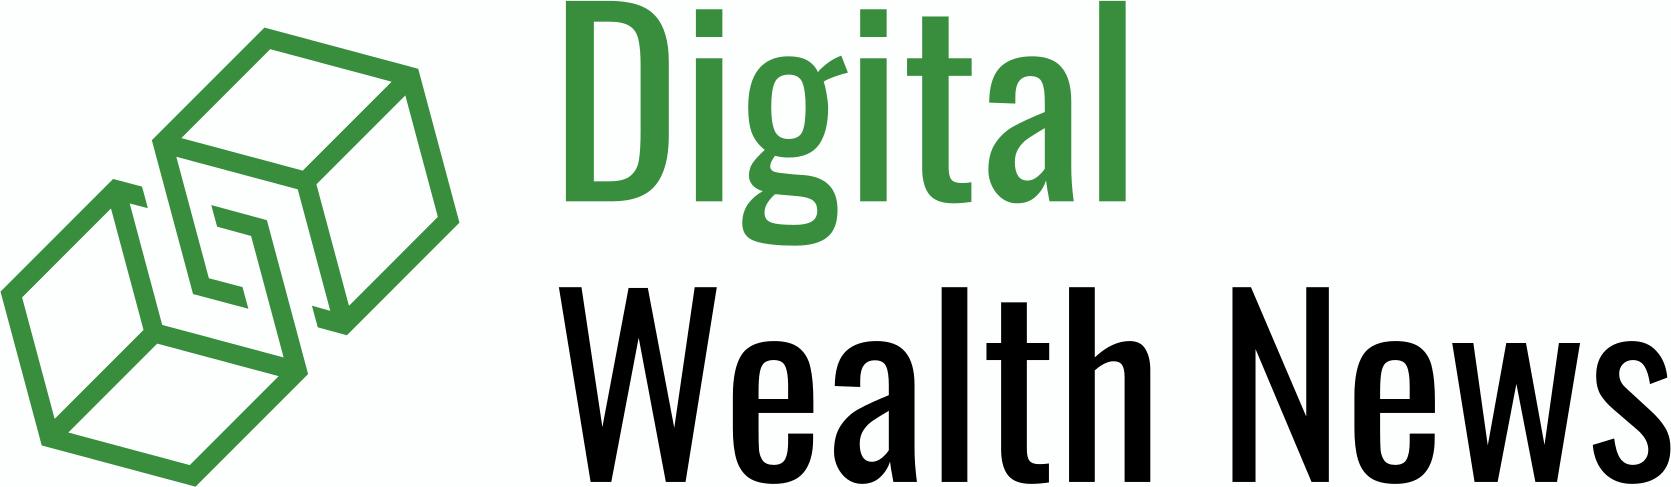 Dwealth.news Logo